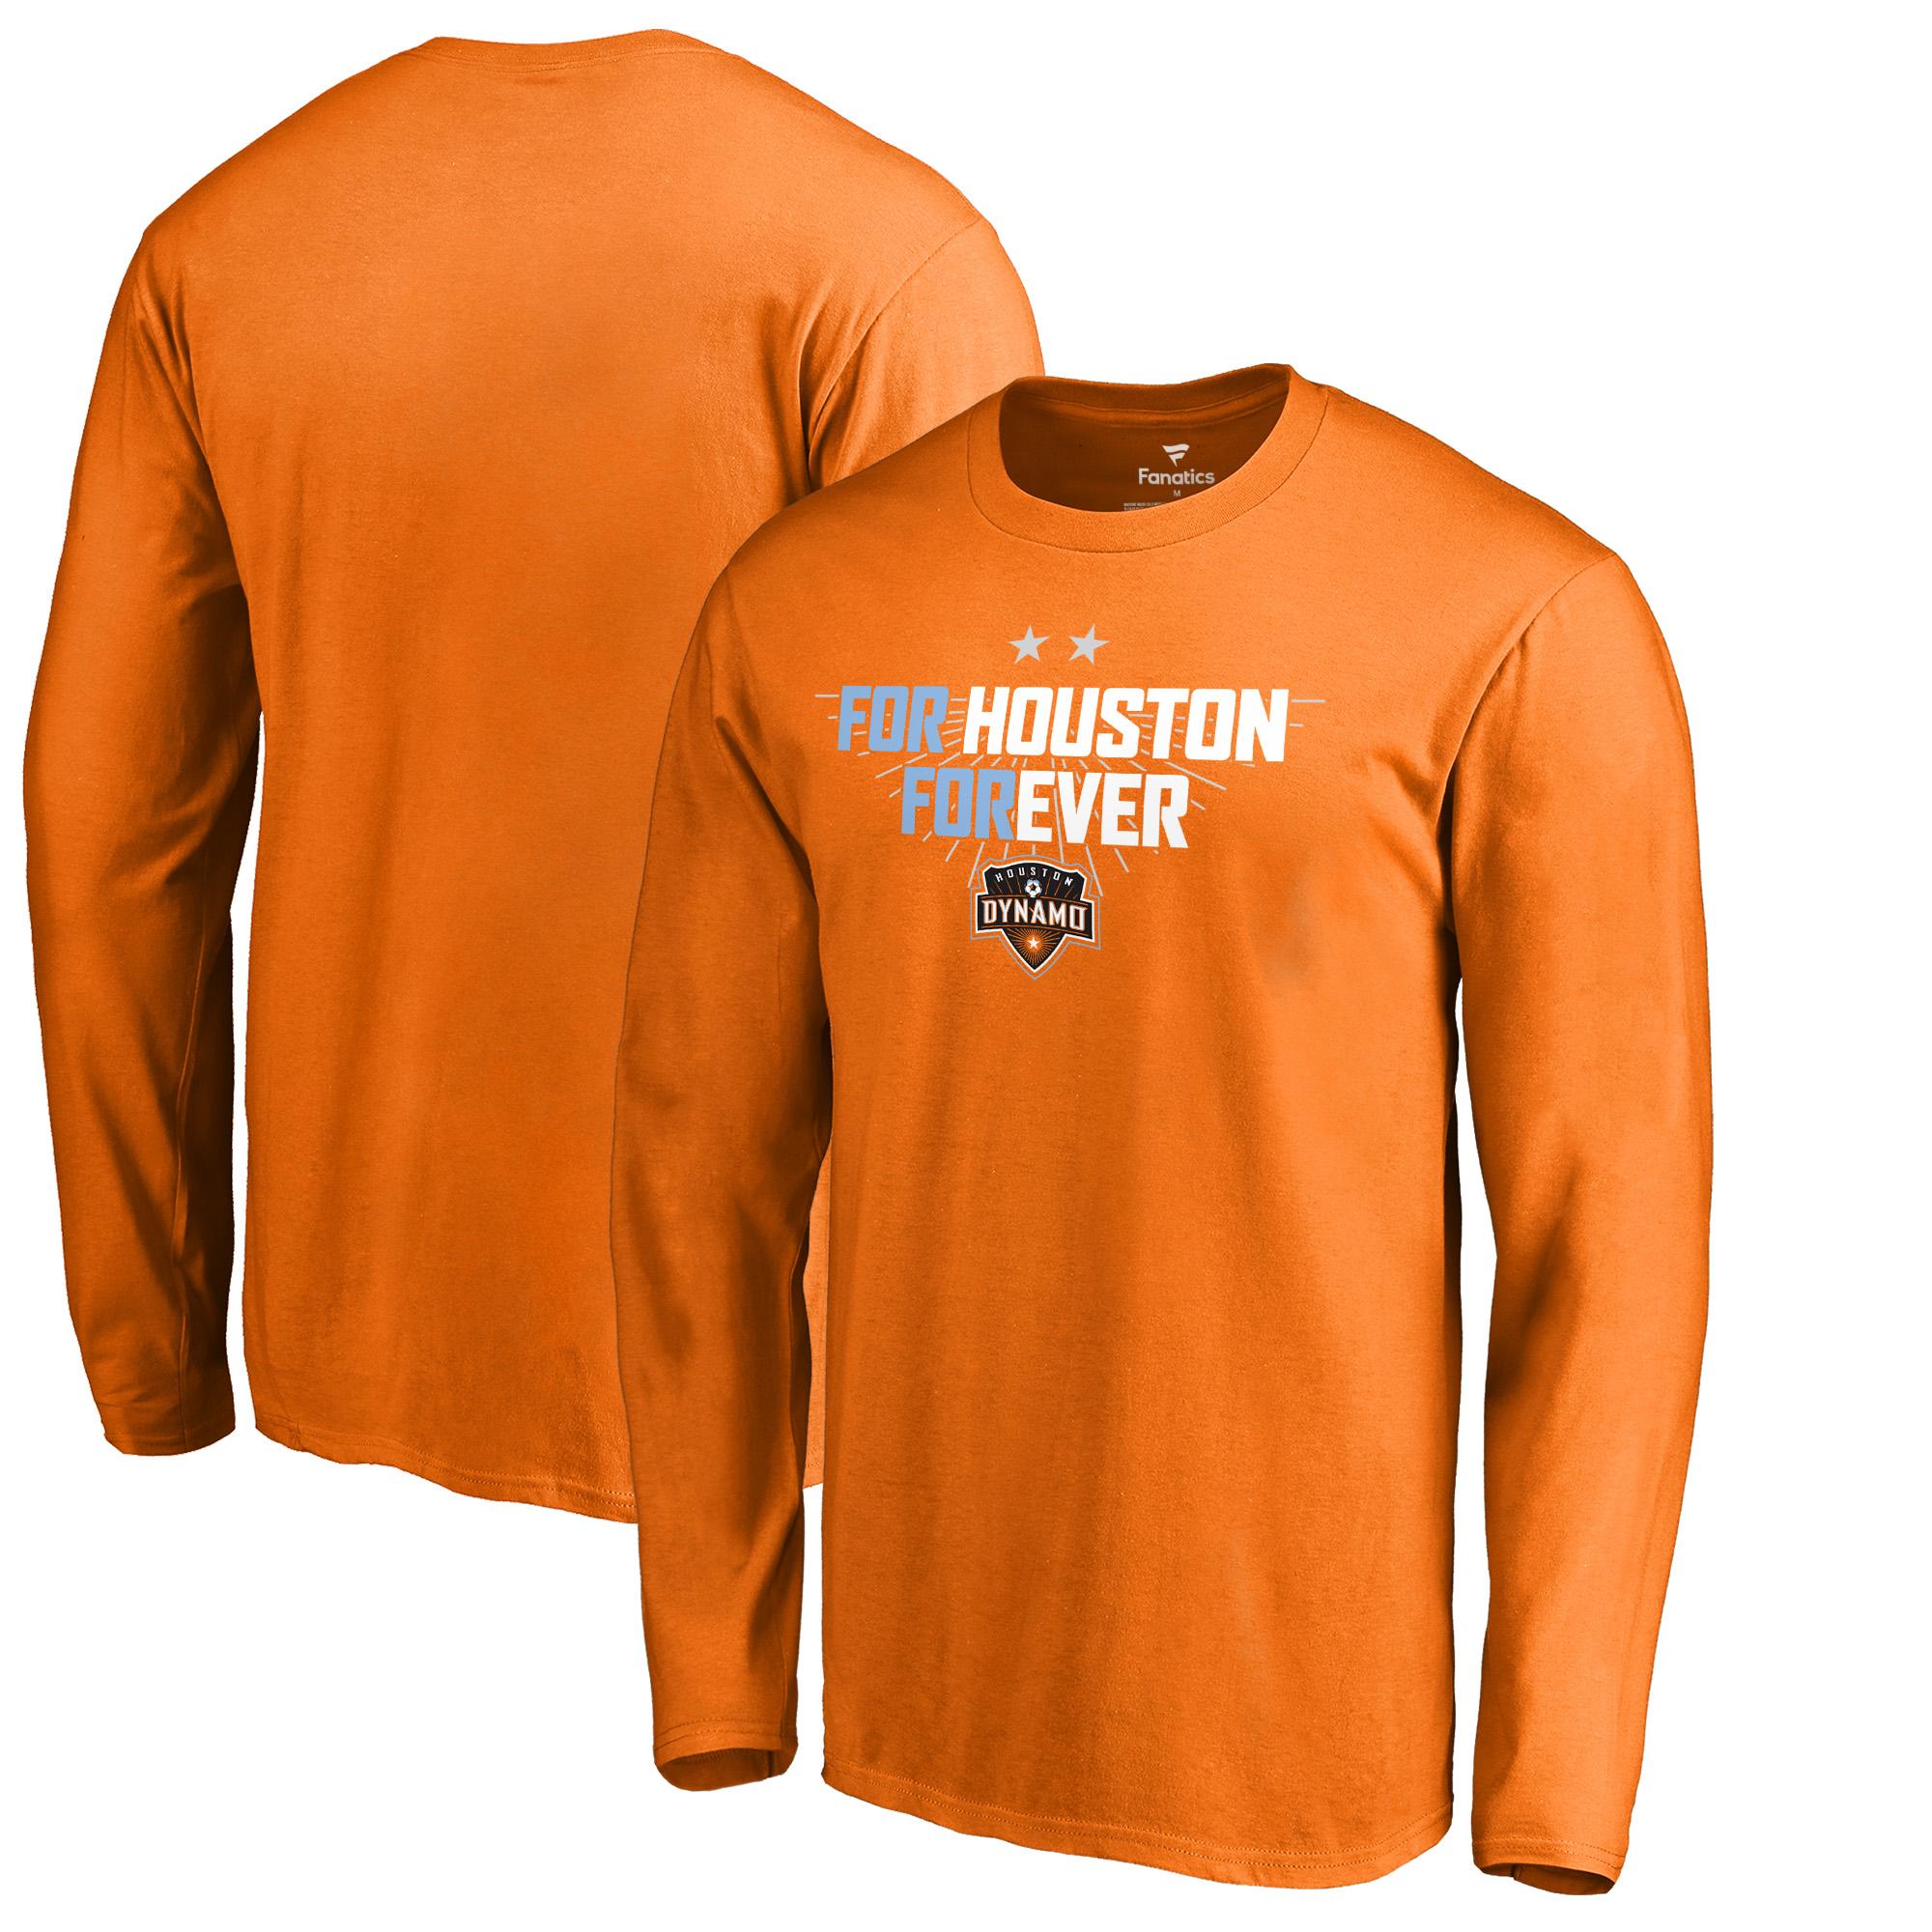 Houston Dynamo Fanatics Branded For Houston Long Sleeve T-Shirt - Tenn Orange